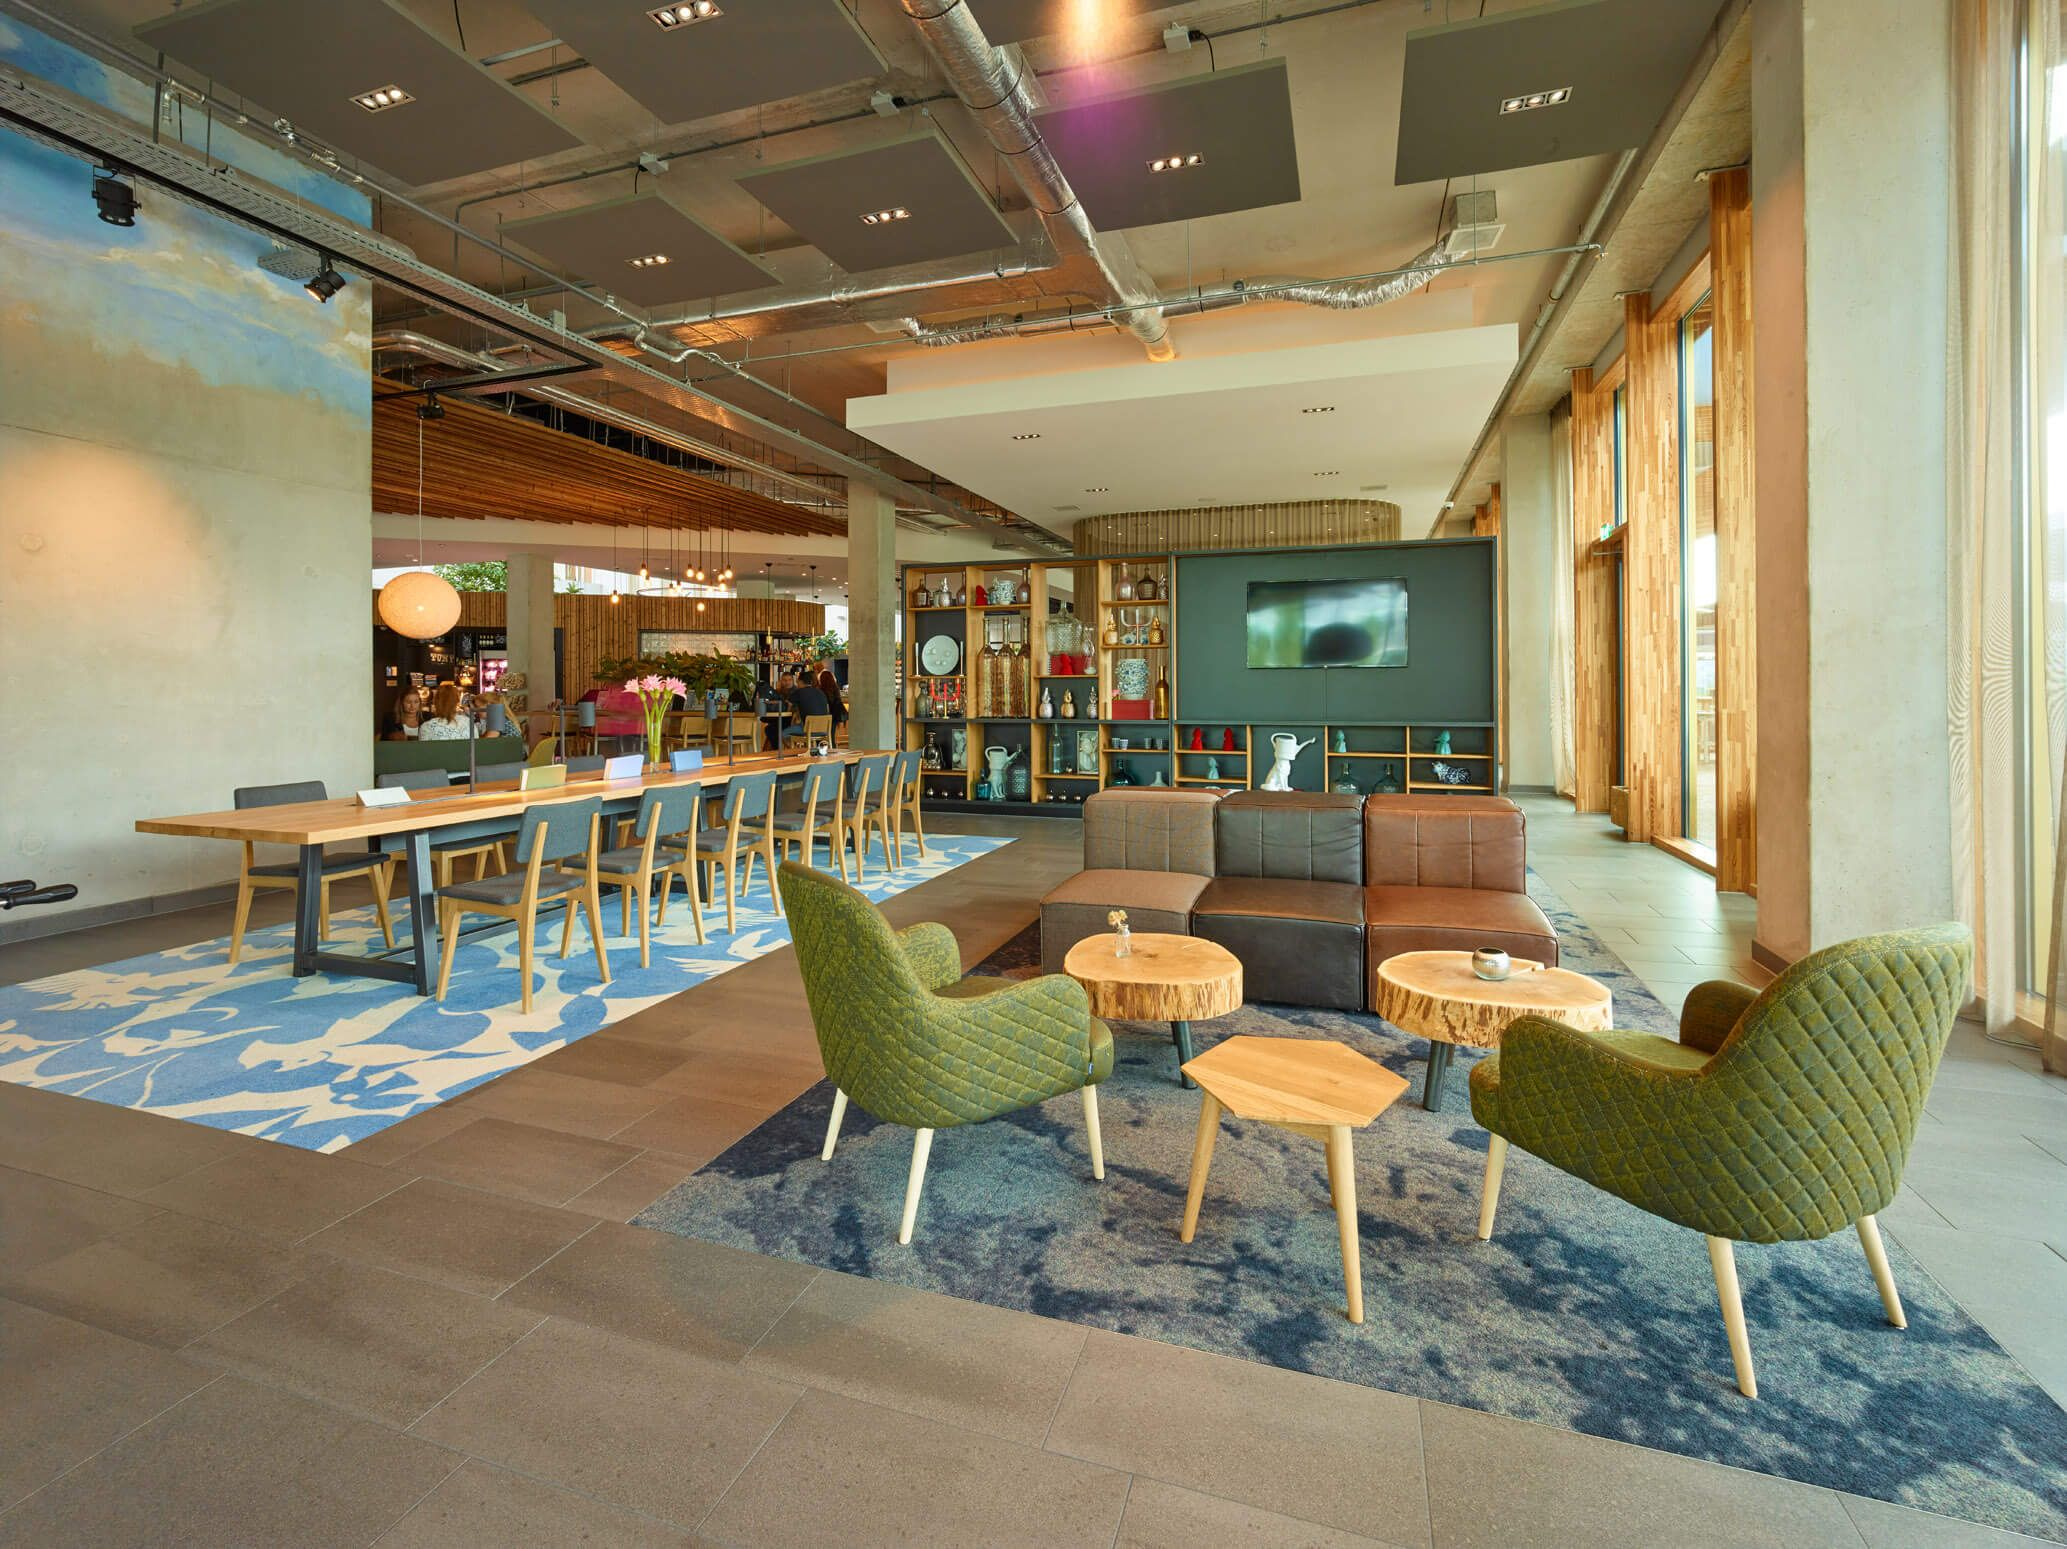 Hotel Novotel Schiphol Airport, Amsterdam. (met